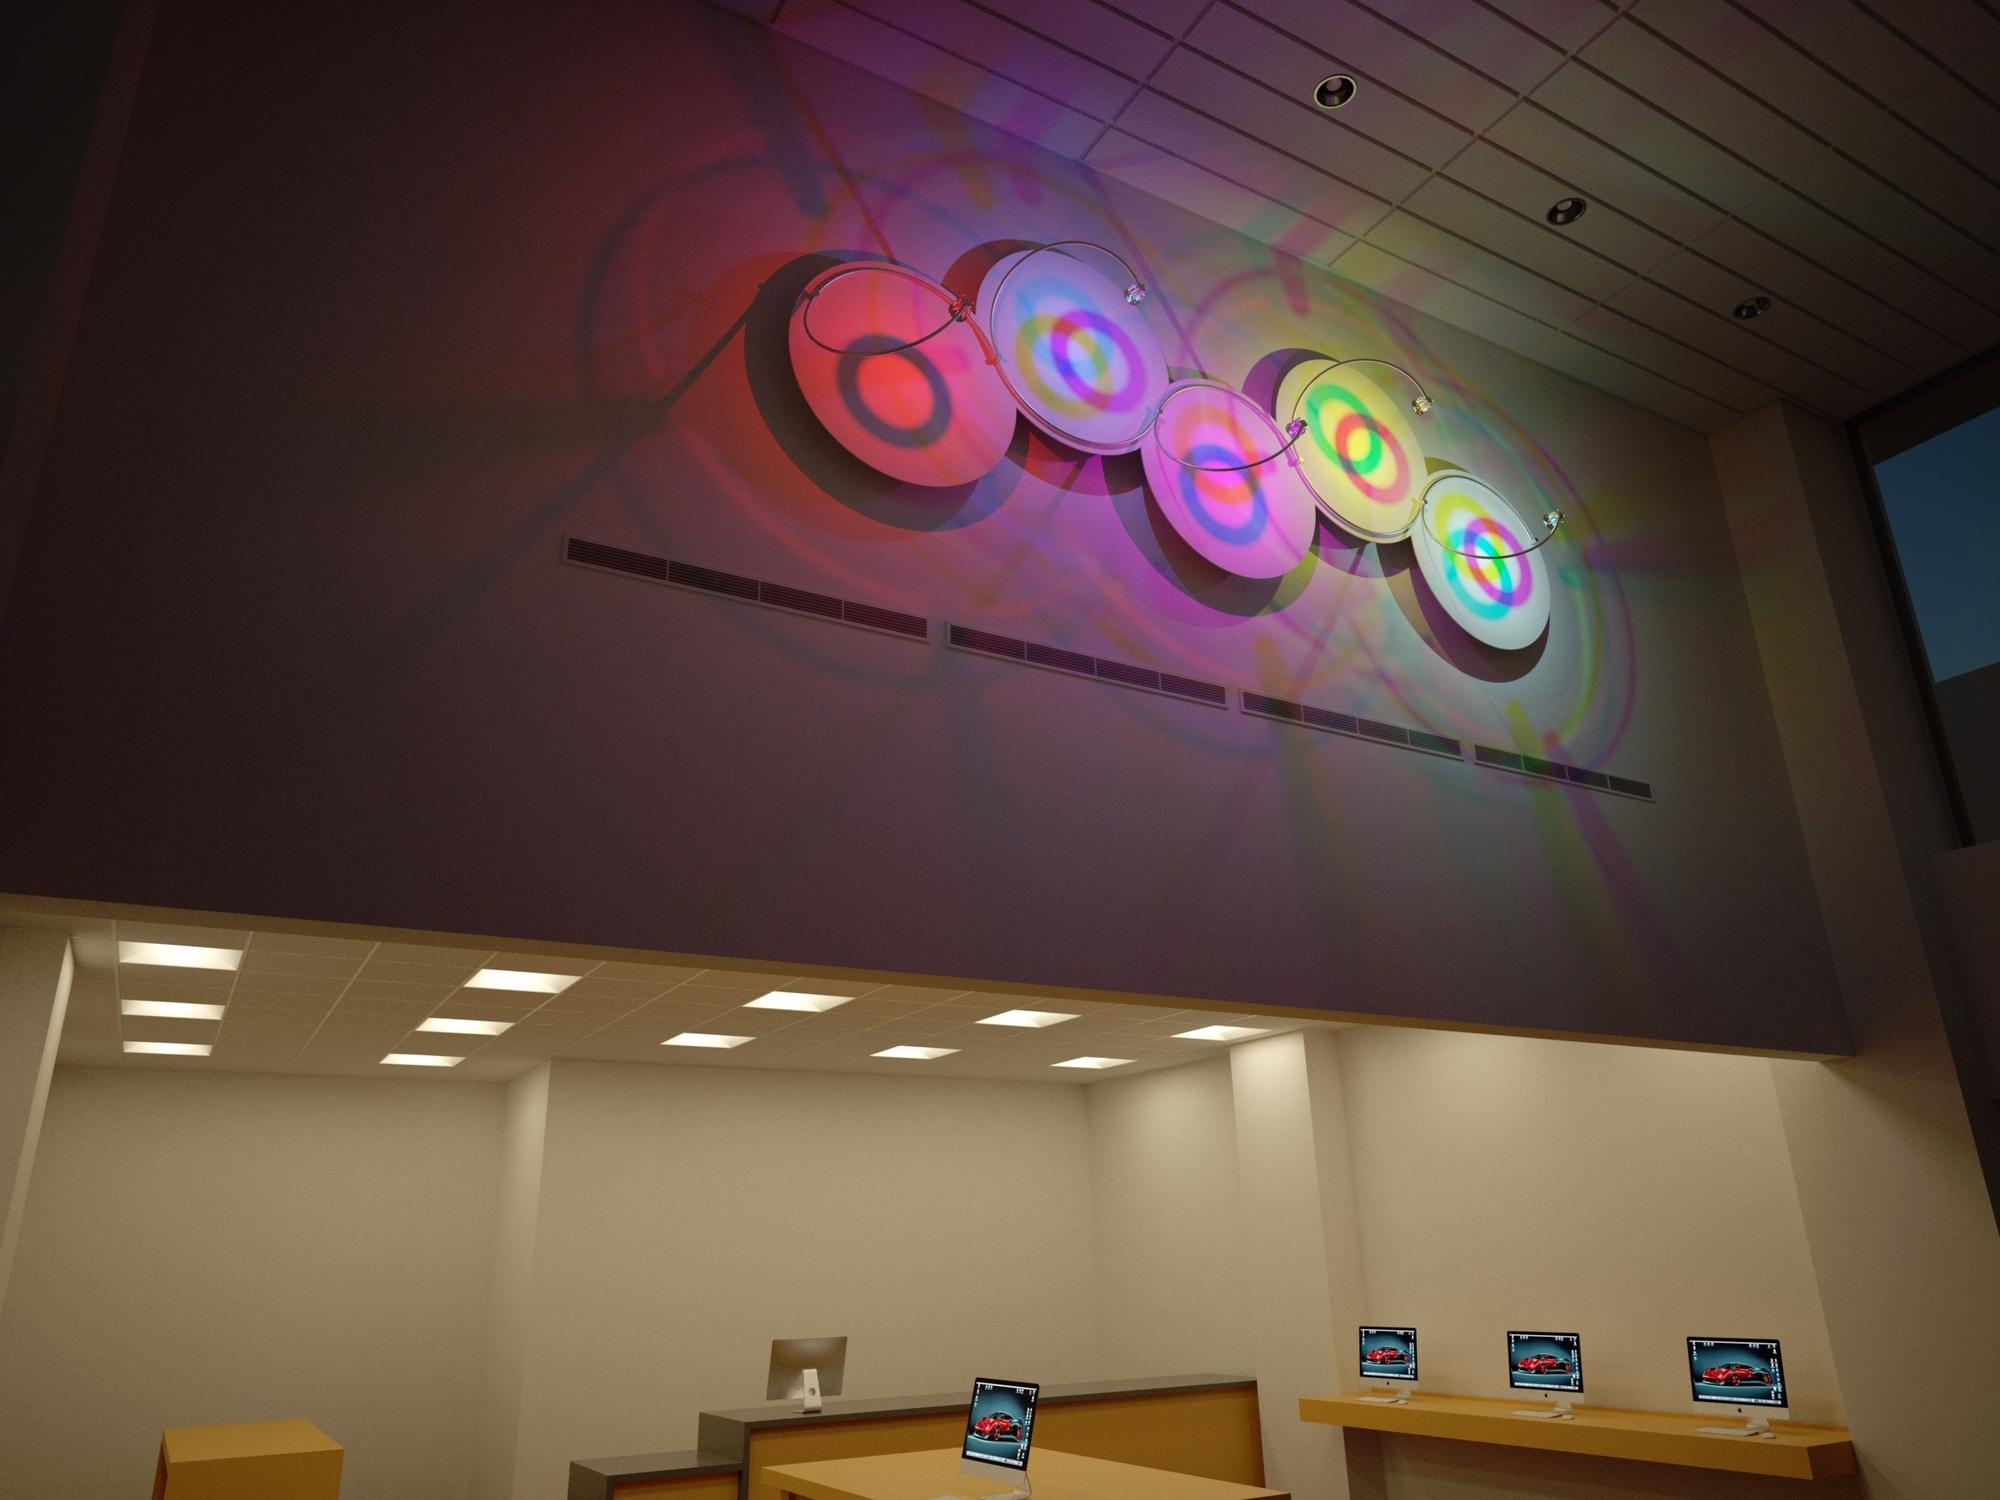 Ceiling Led Lighting Systems : Led lighting system autodesk gallery